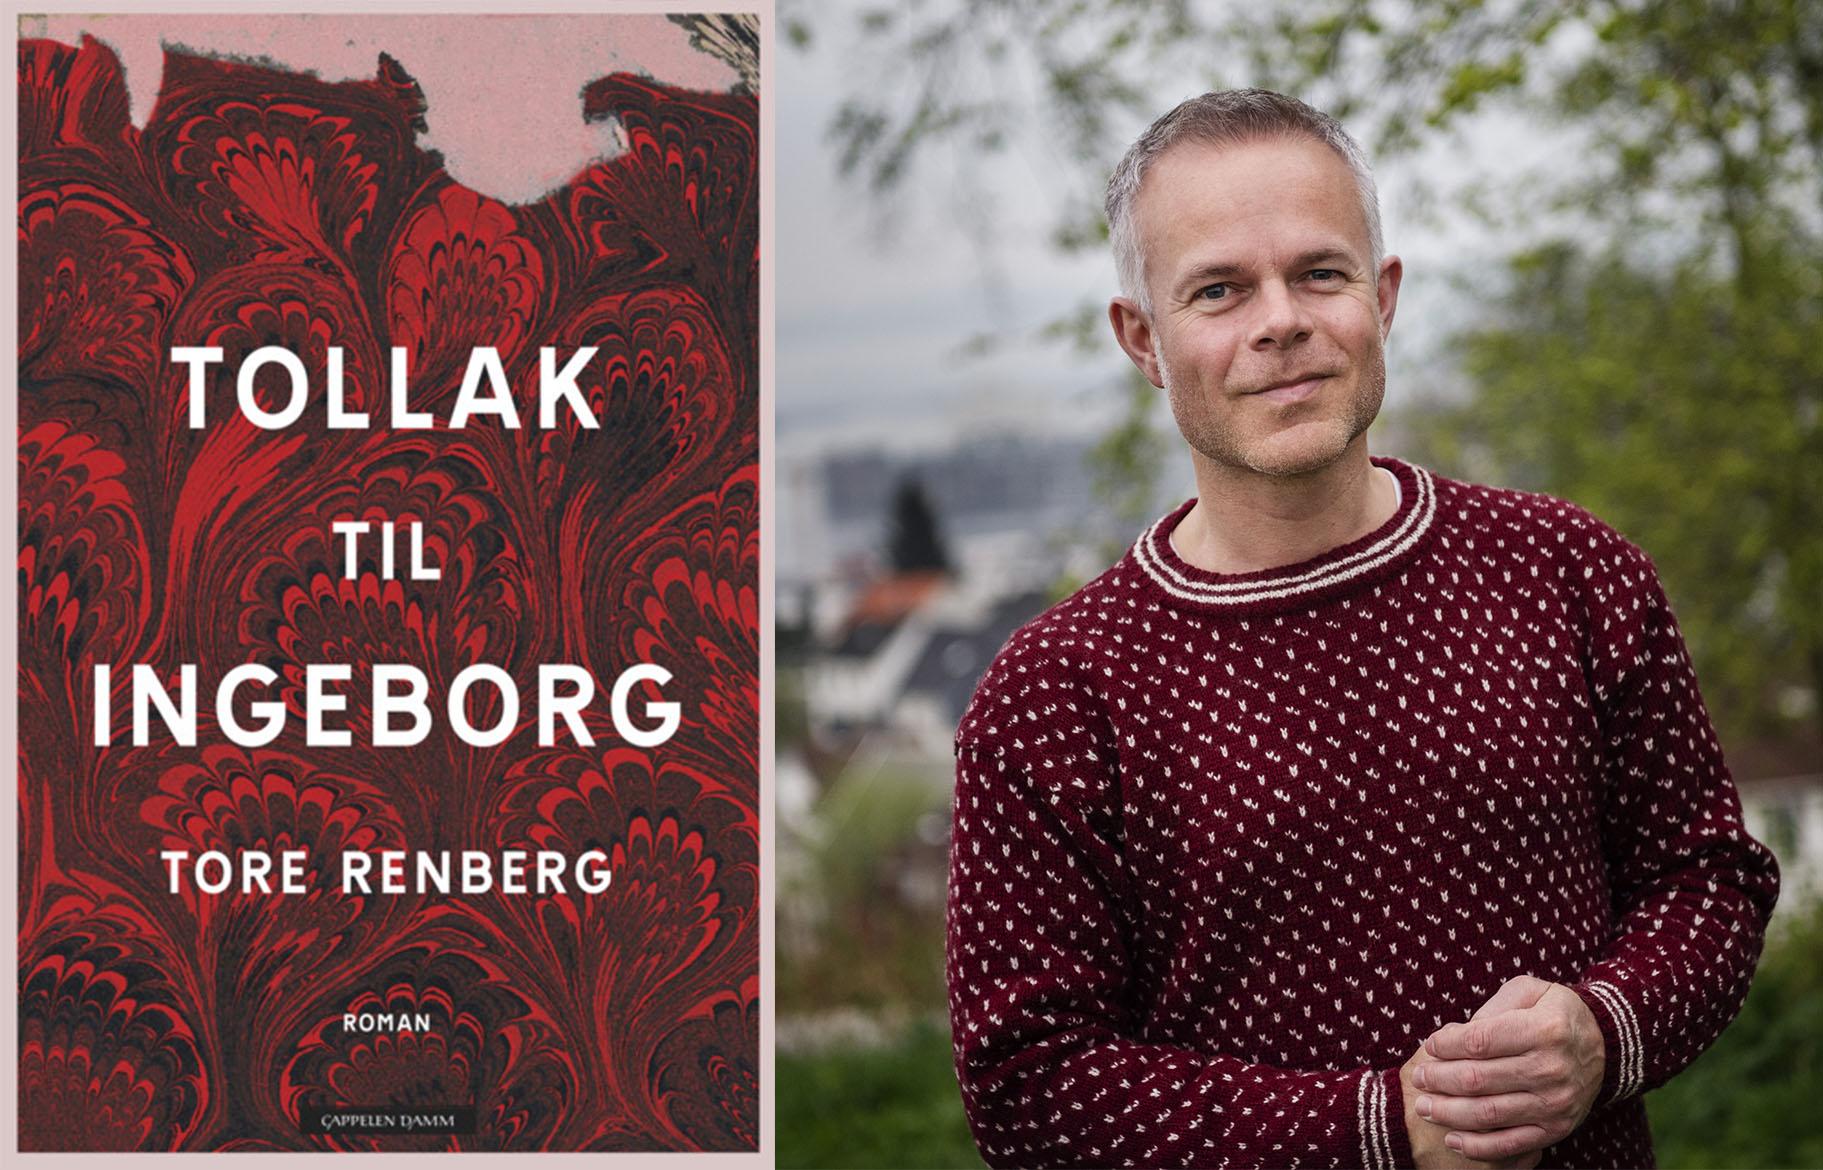 Tore Renberg Tollak til Ingeborg